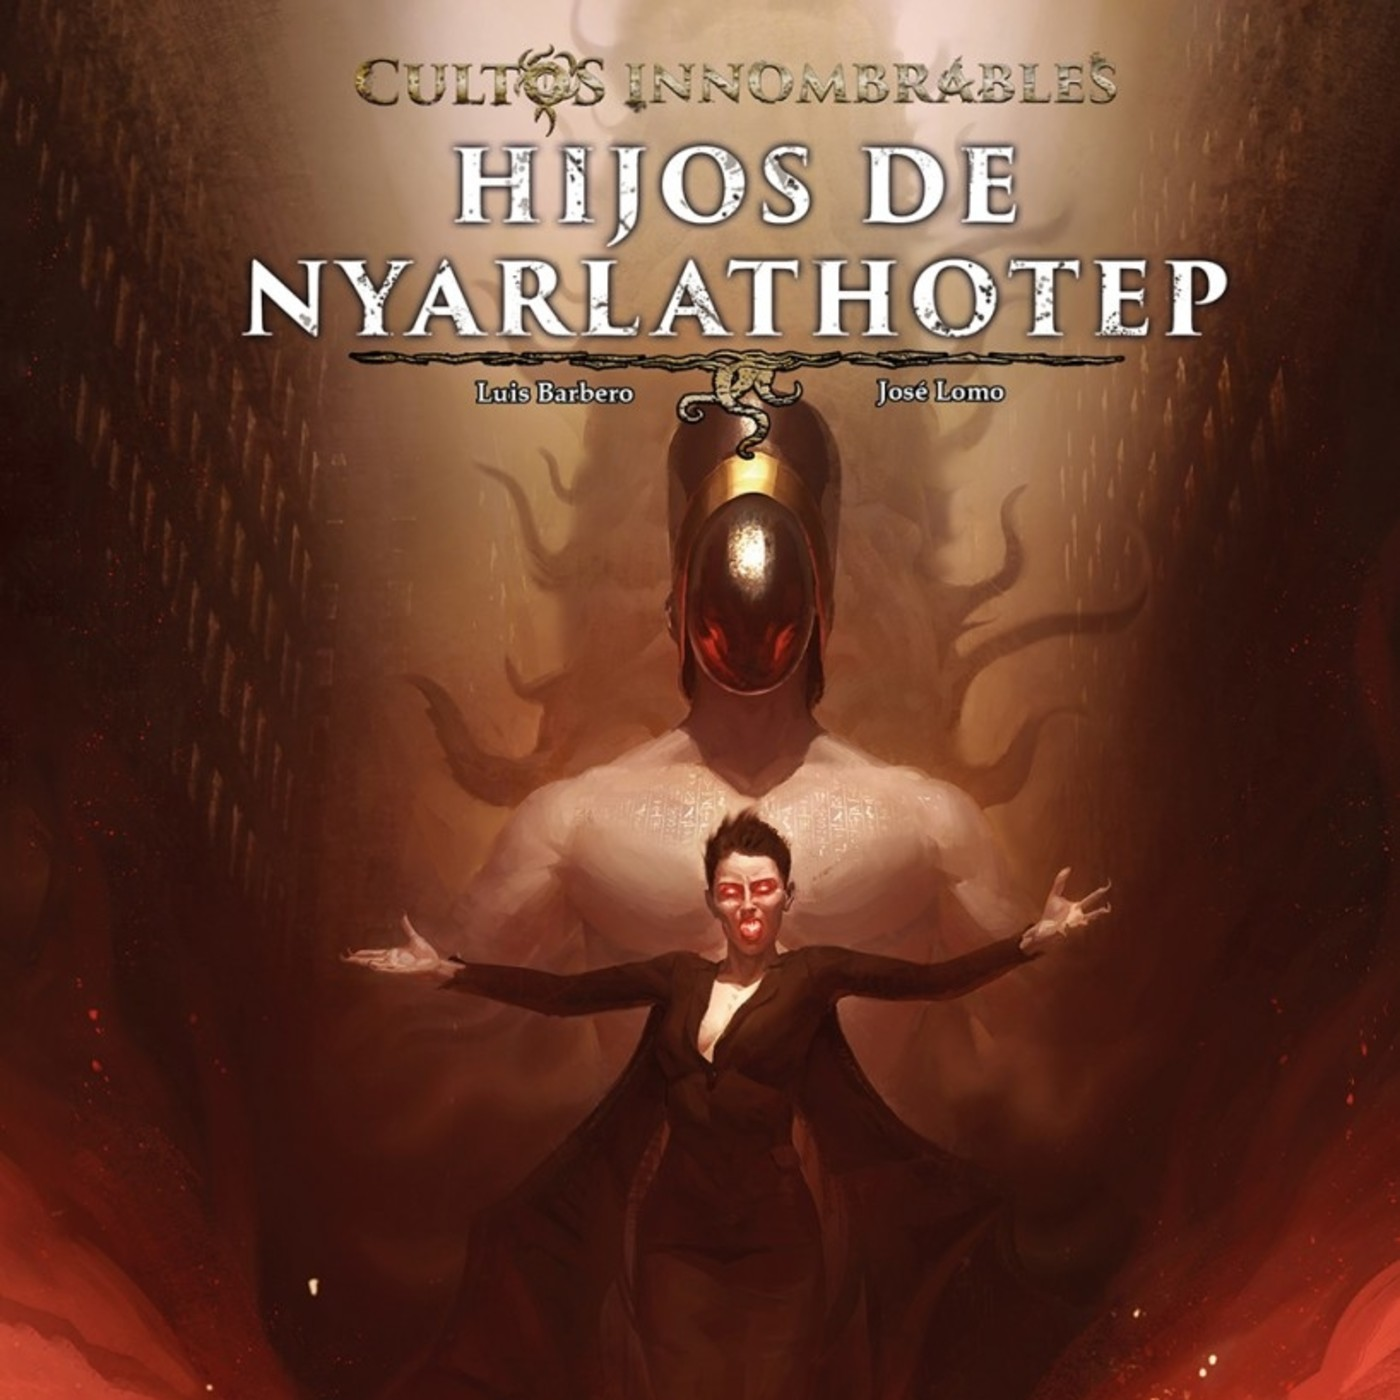 Hijos de Nyarlathotep - 13 - Viajeros